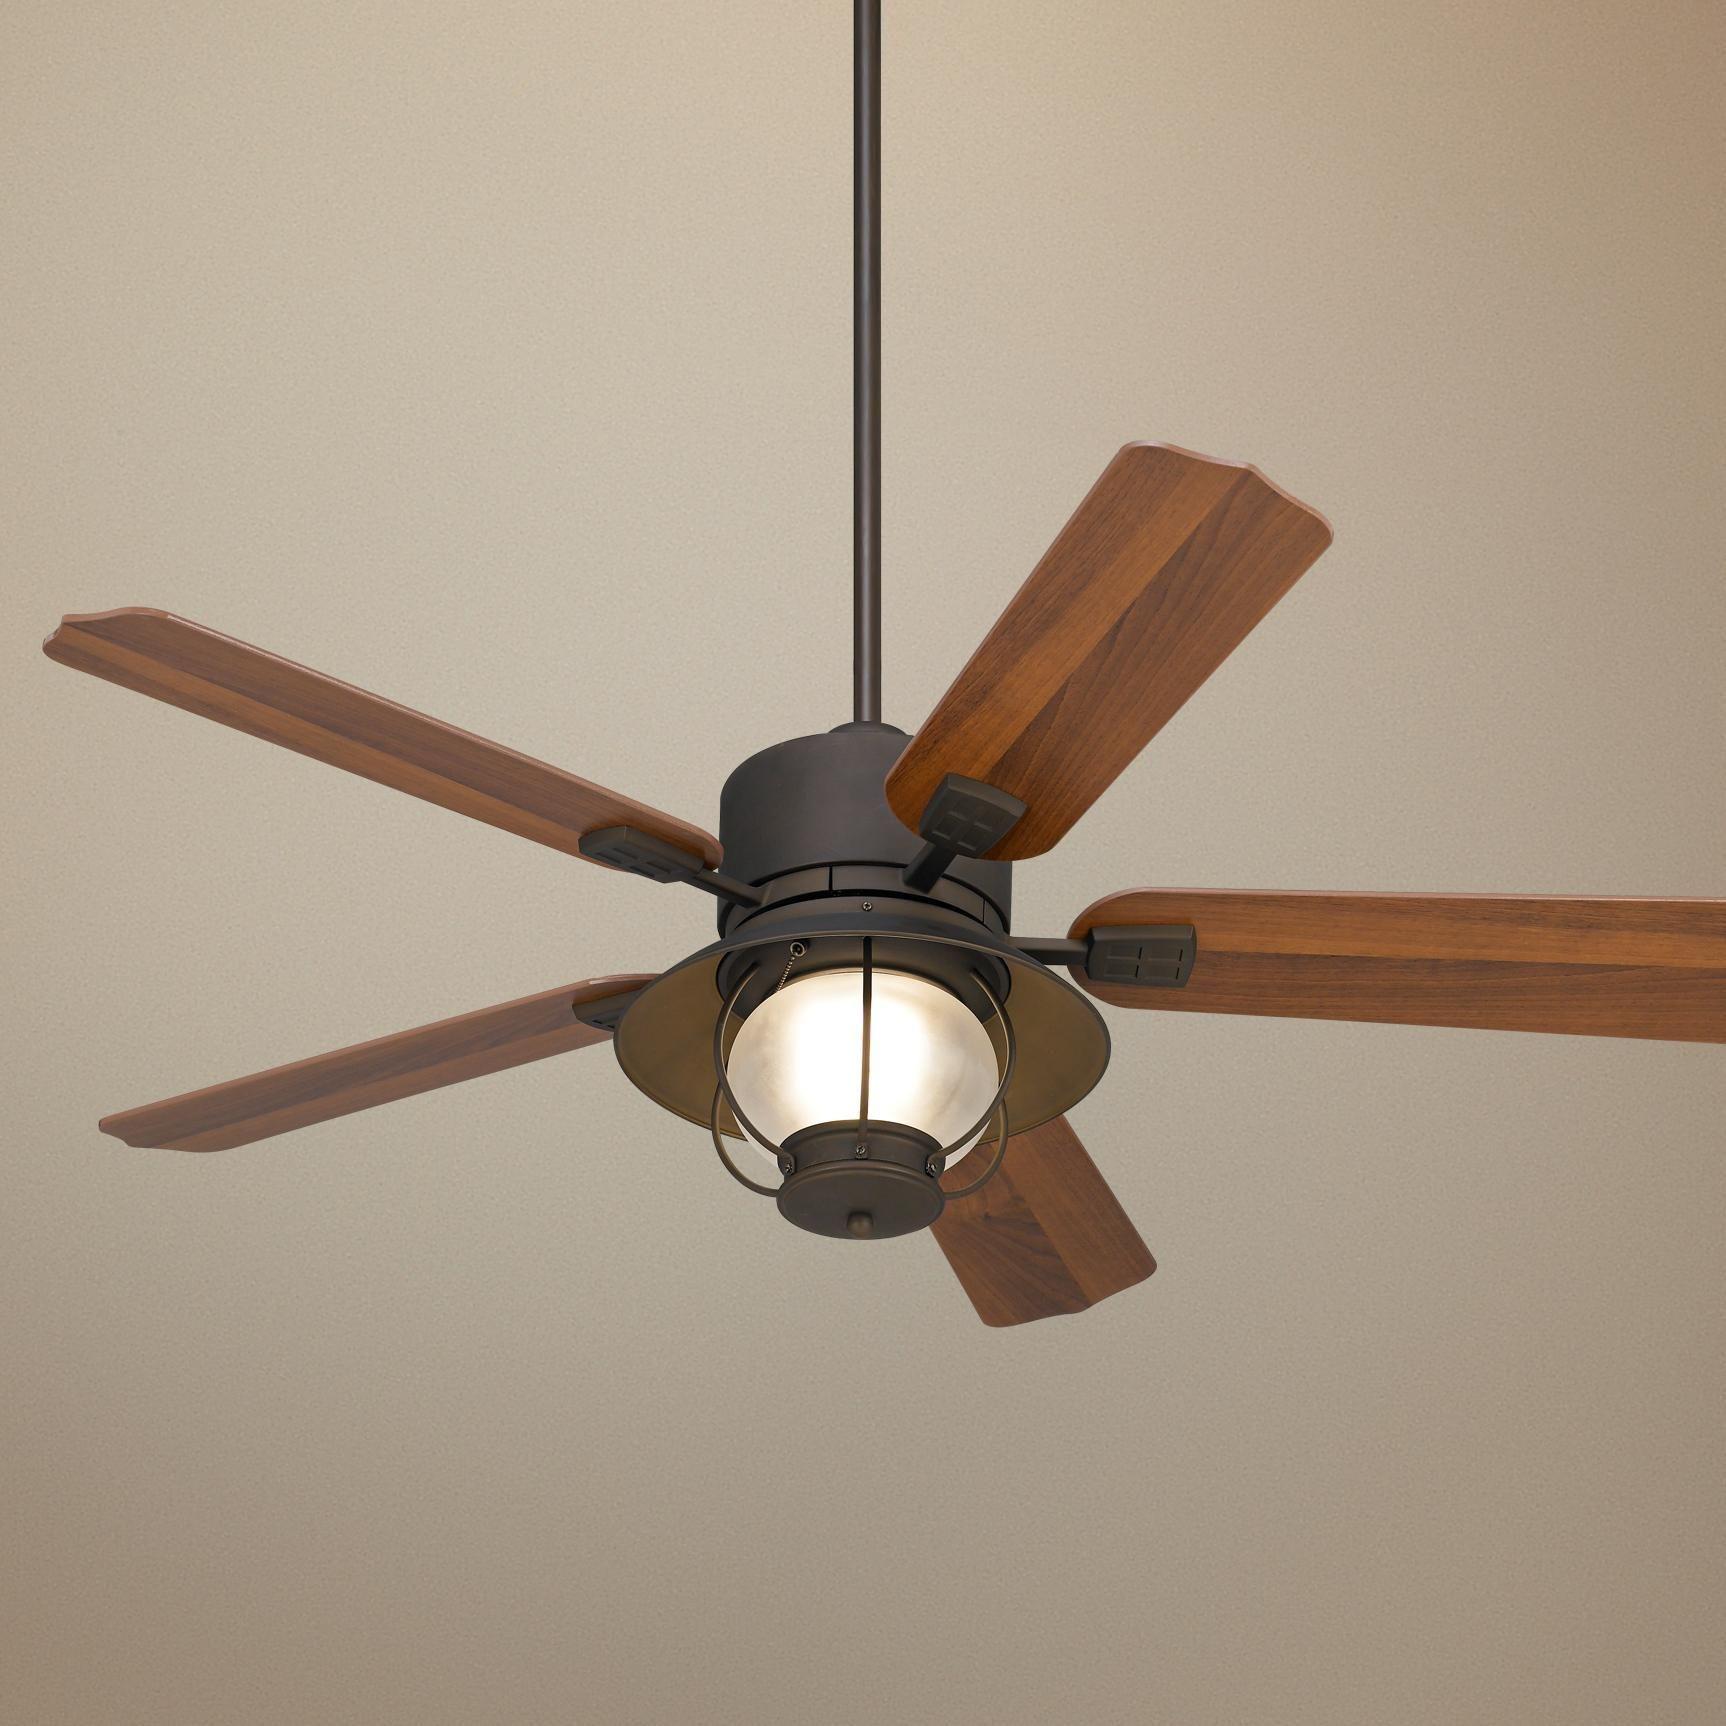 Portola Orb Finish Indoor Outdoor Ceiling Fan P9518 Lamps Plus Ceiling Fan Outdoor Ceiling Fans Ceiling Fan Light Fixtures